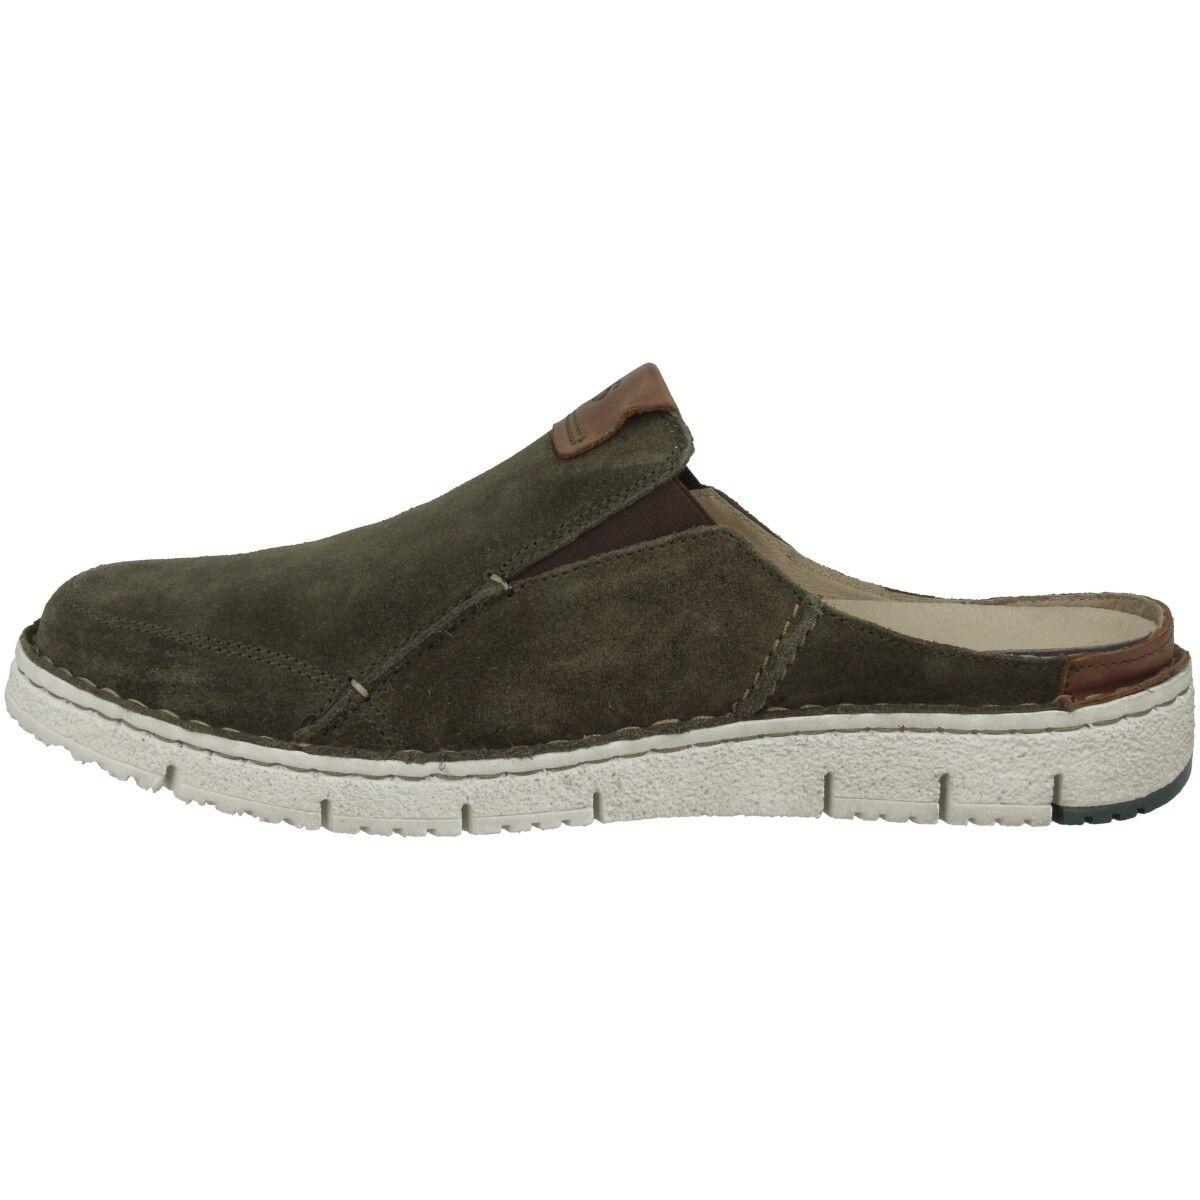 Josef Seibel Ruben 17 zapatos Men Mens Slipper Comfort Sandal 47717-949-681